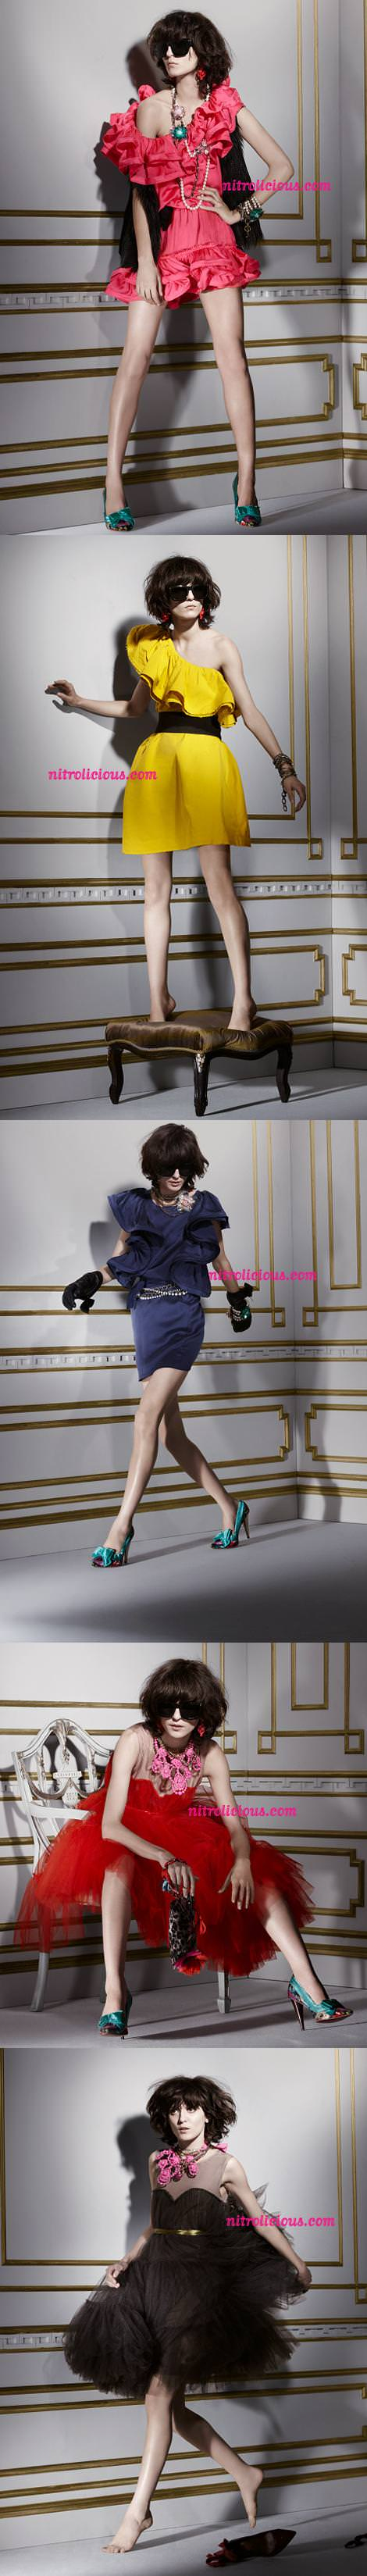 Lanvin for H&M: Lookbook